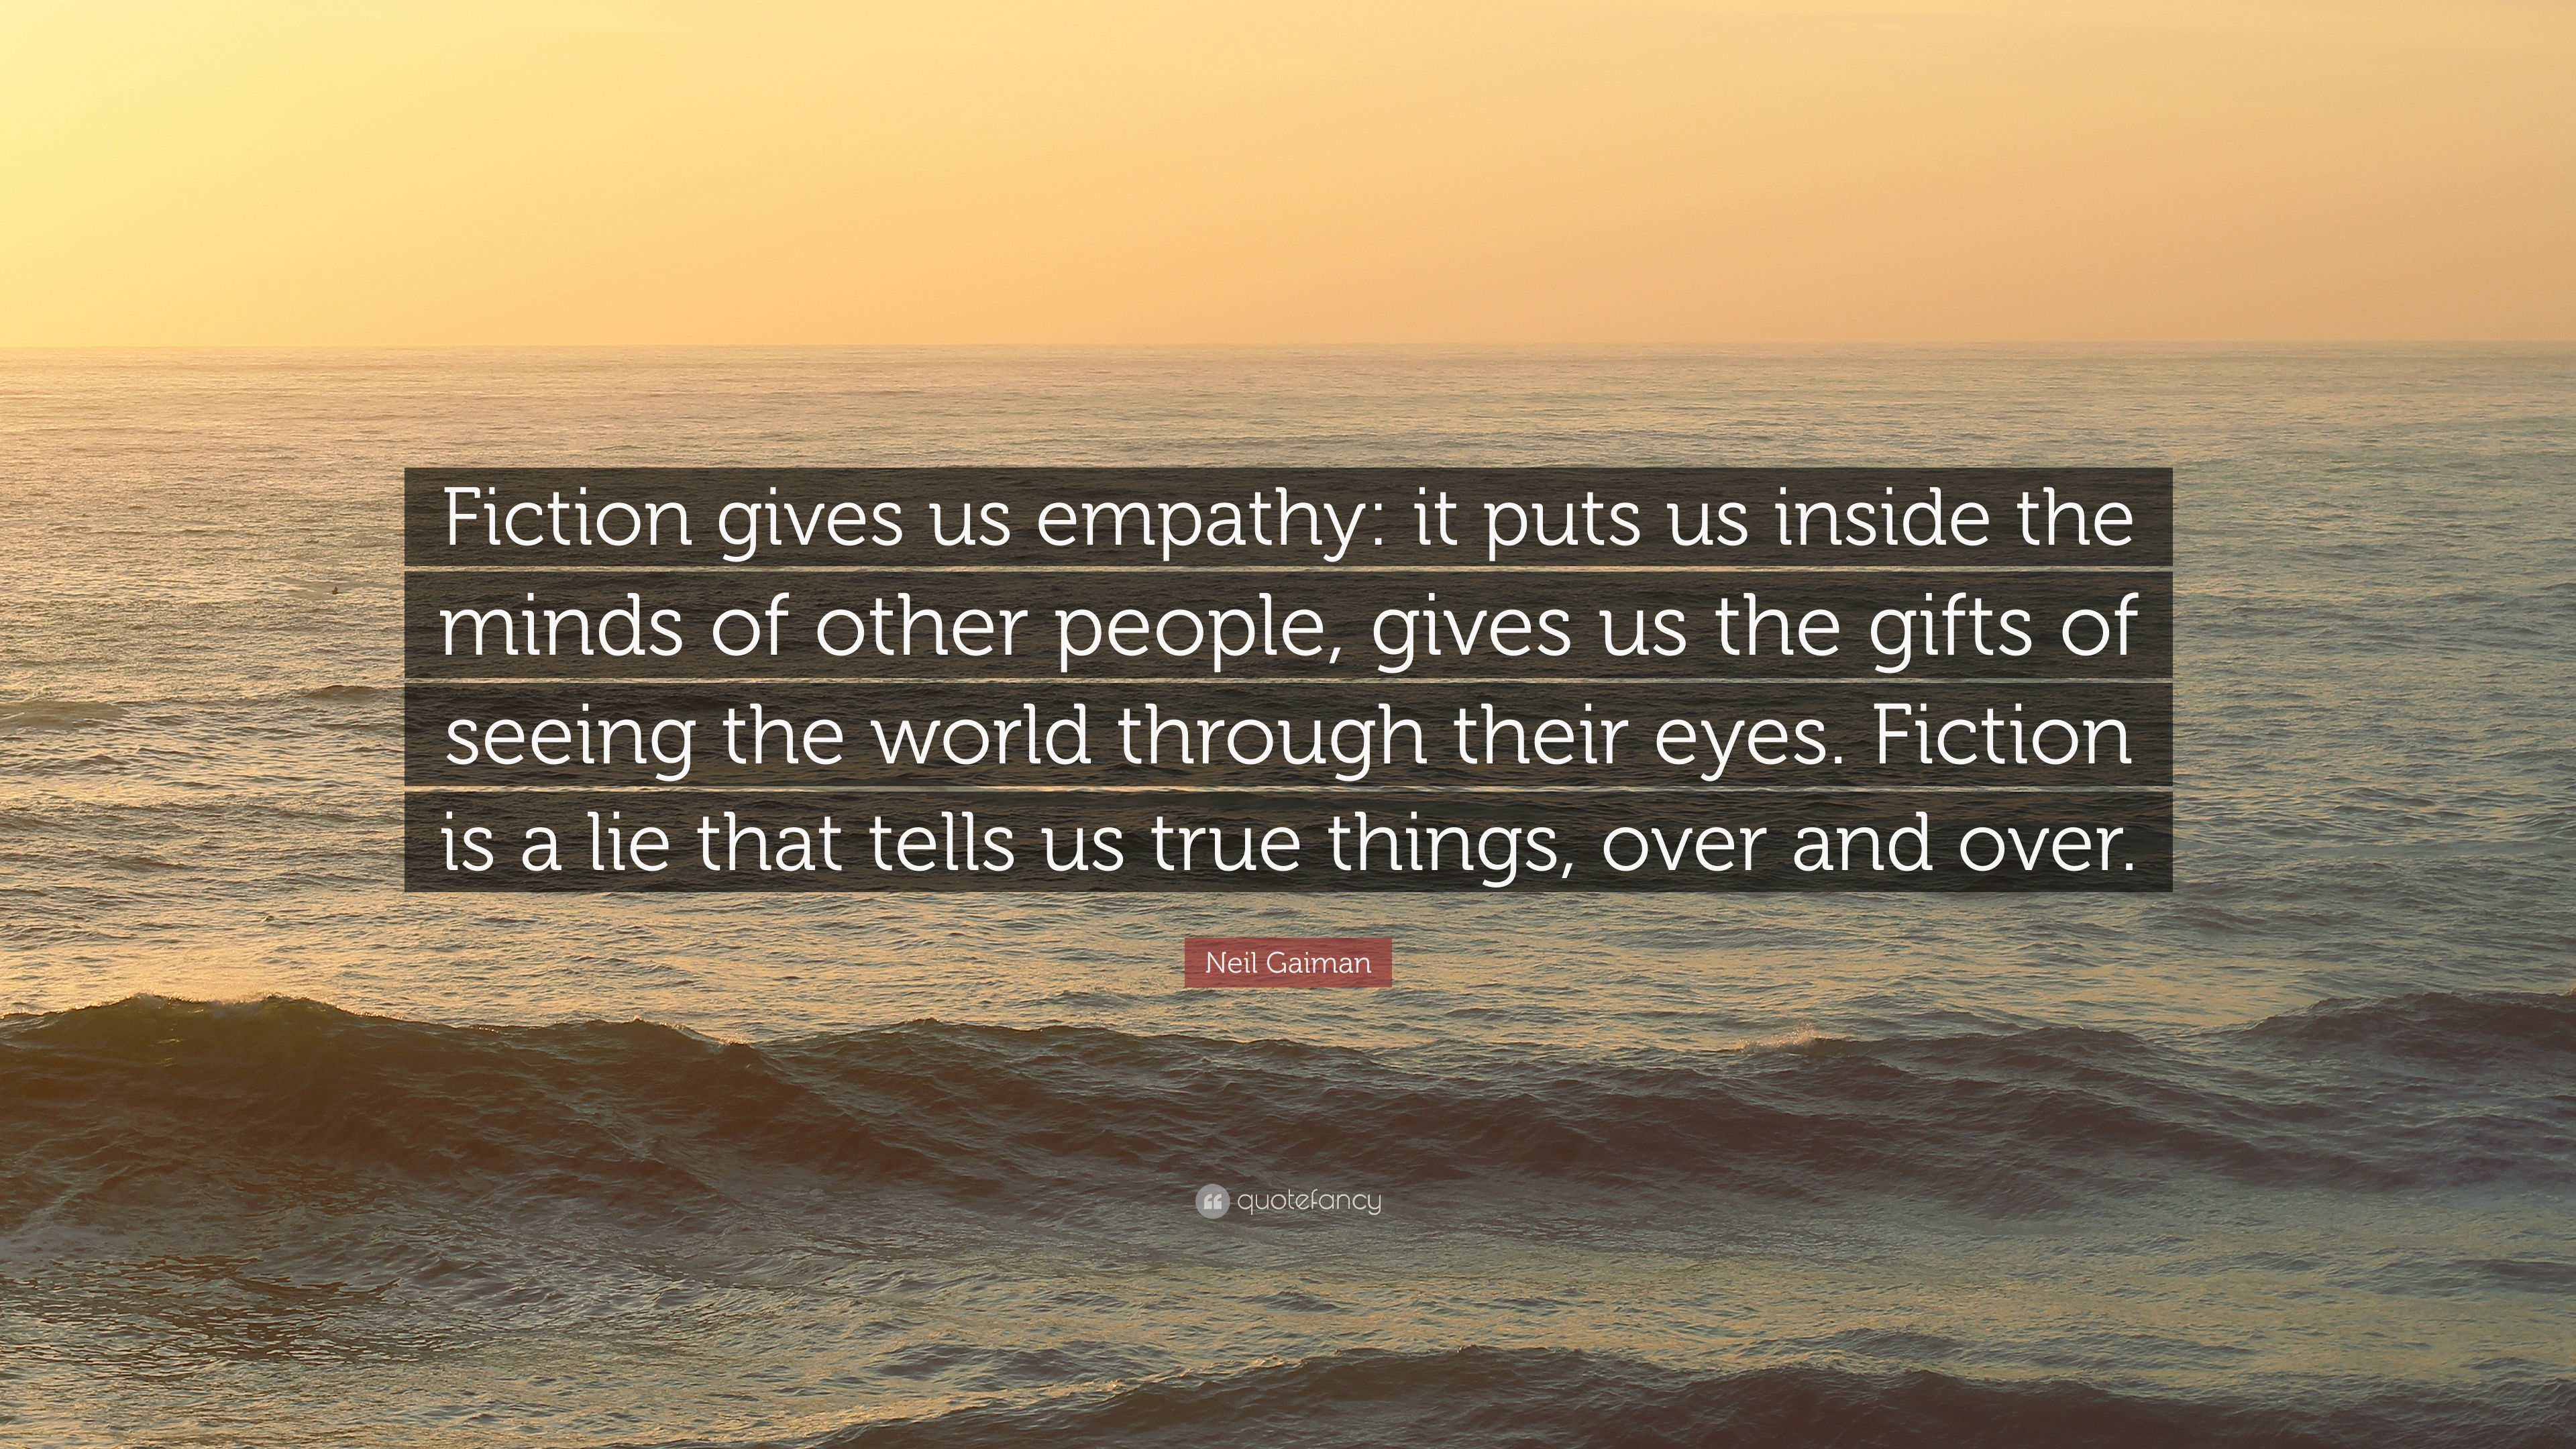 Neil Gaiman Quote Fiction Gives Us Empathy It Puts Us Inside The